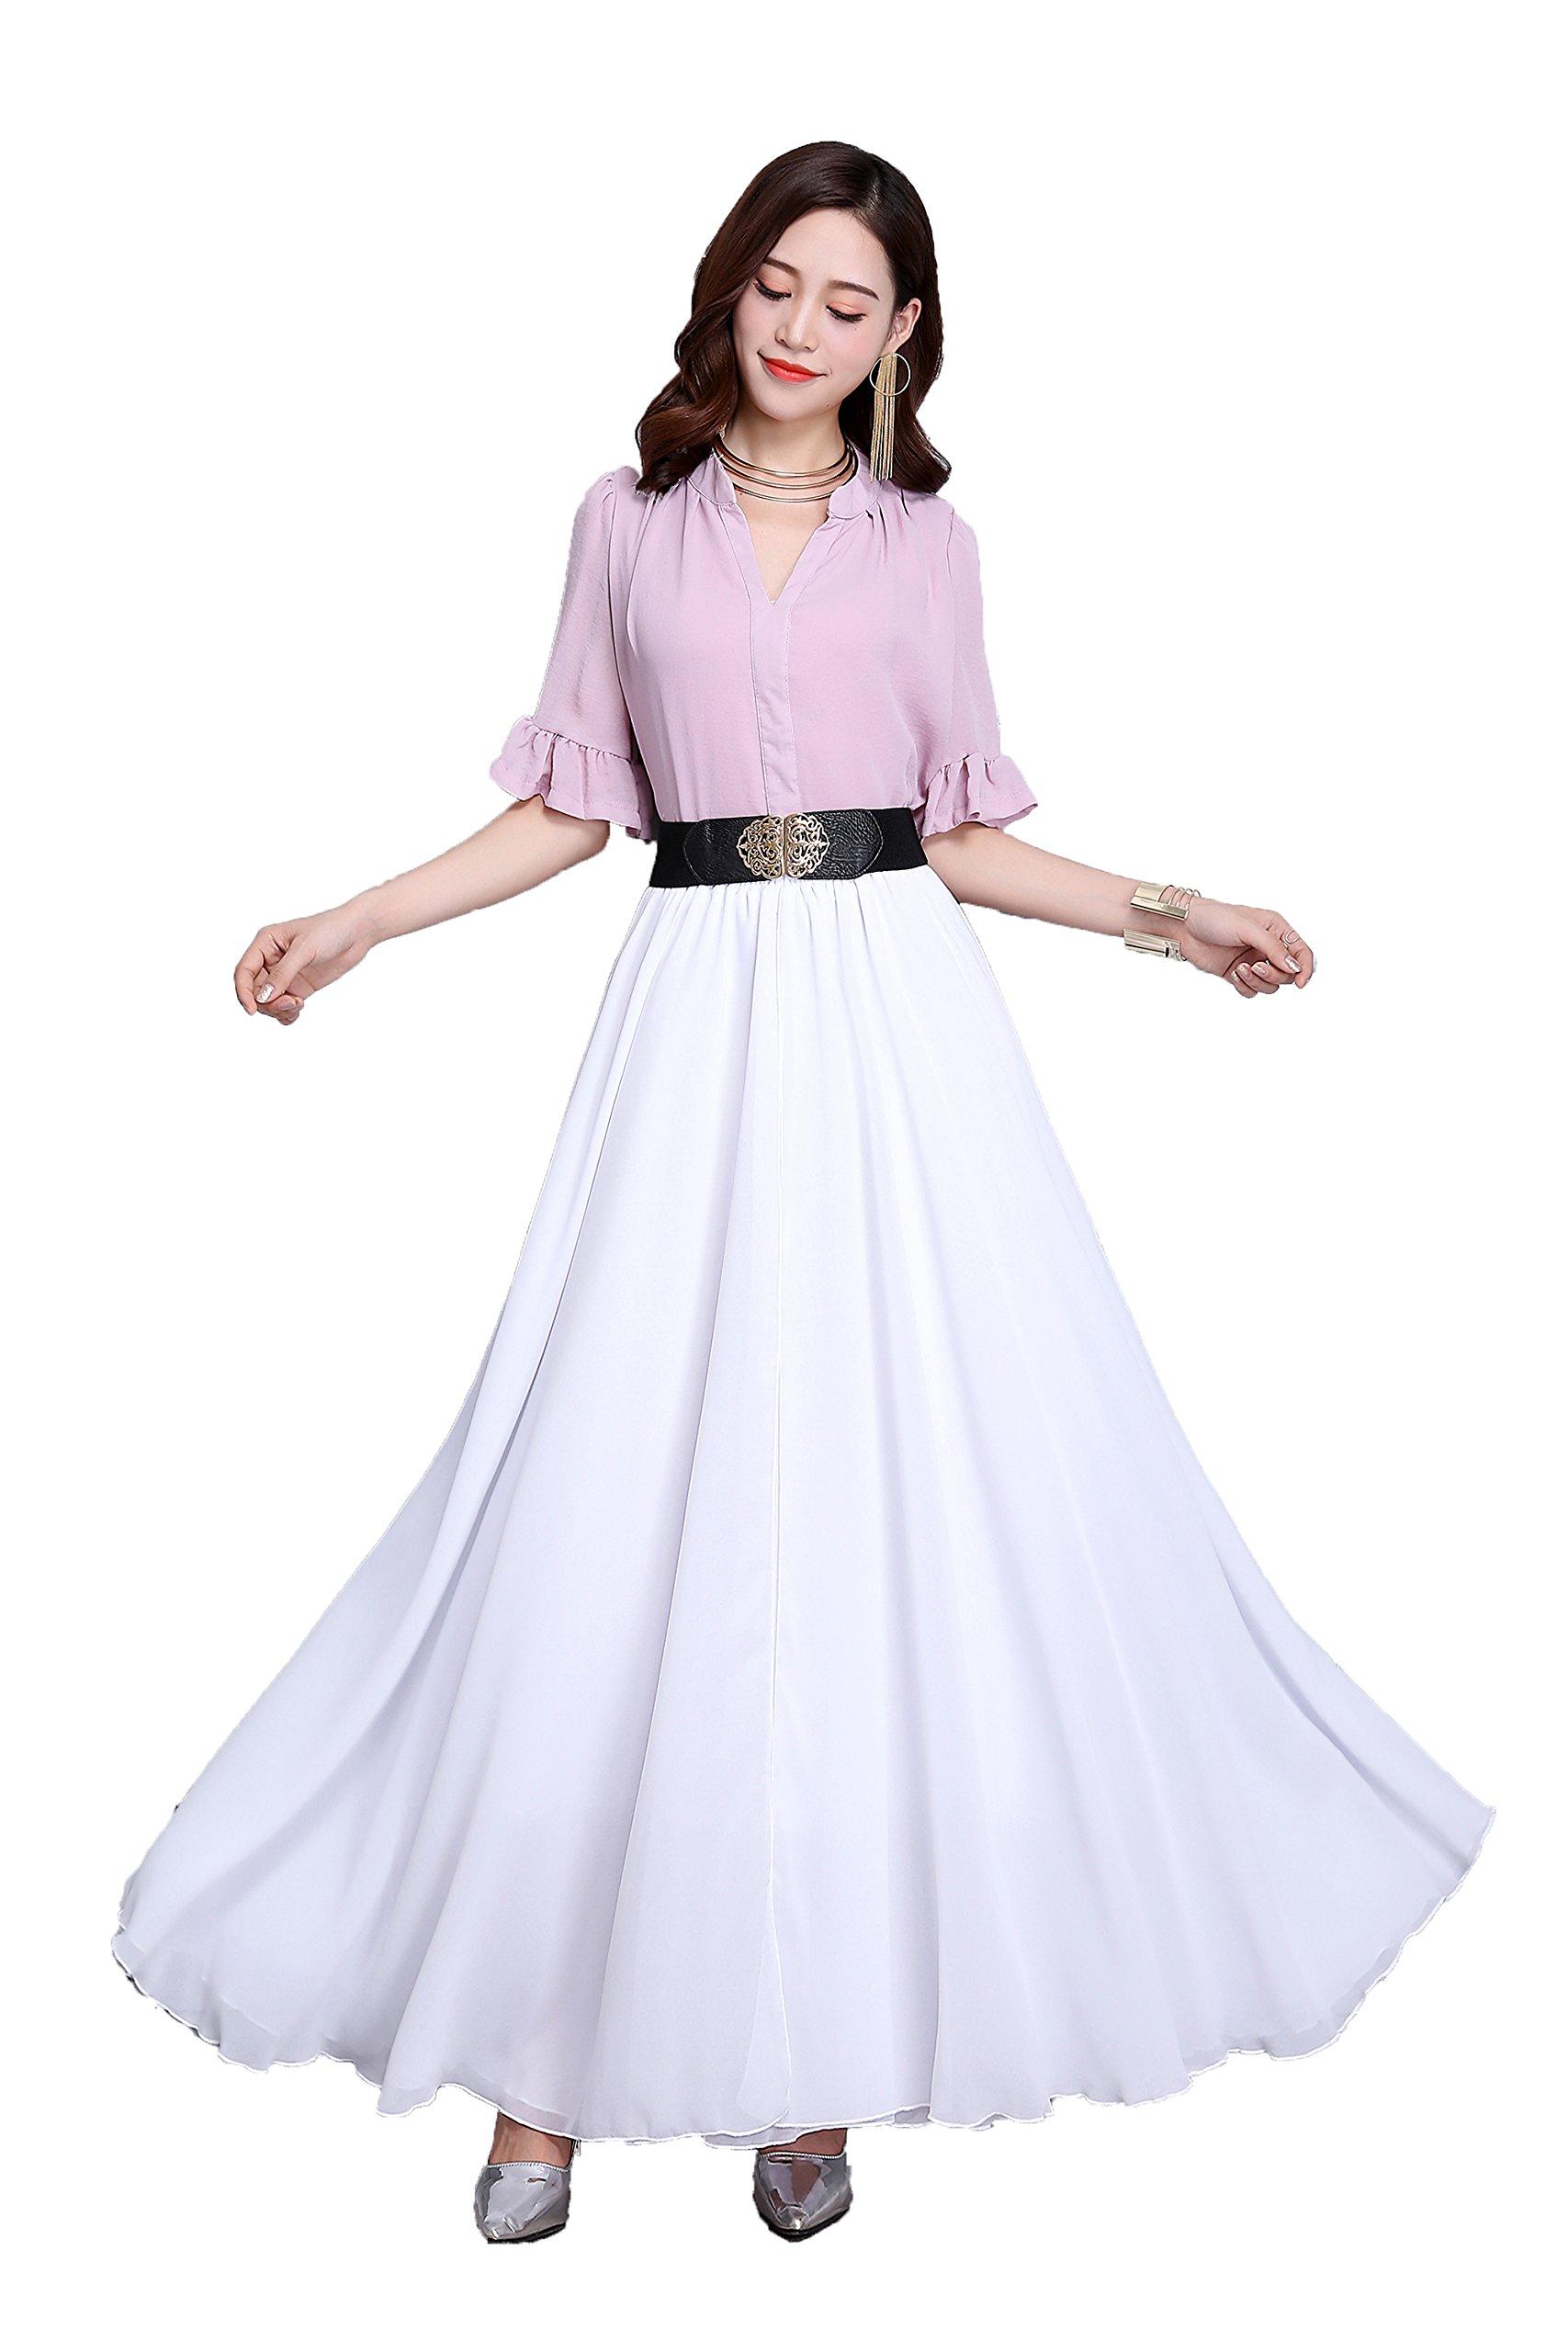 Sissily Women Summer Chiffon High Waist Pleated Big Hem Full/Ankle Length Beach Maxi Skirt(Large/White)